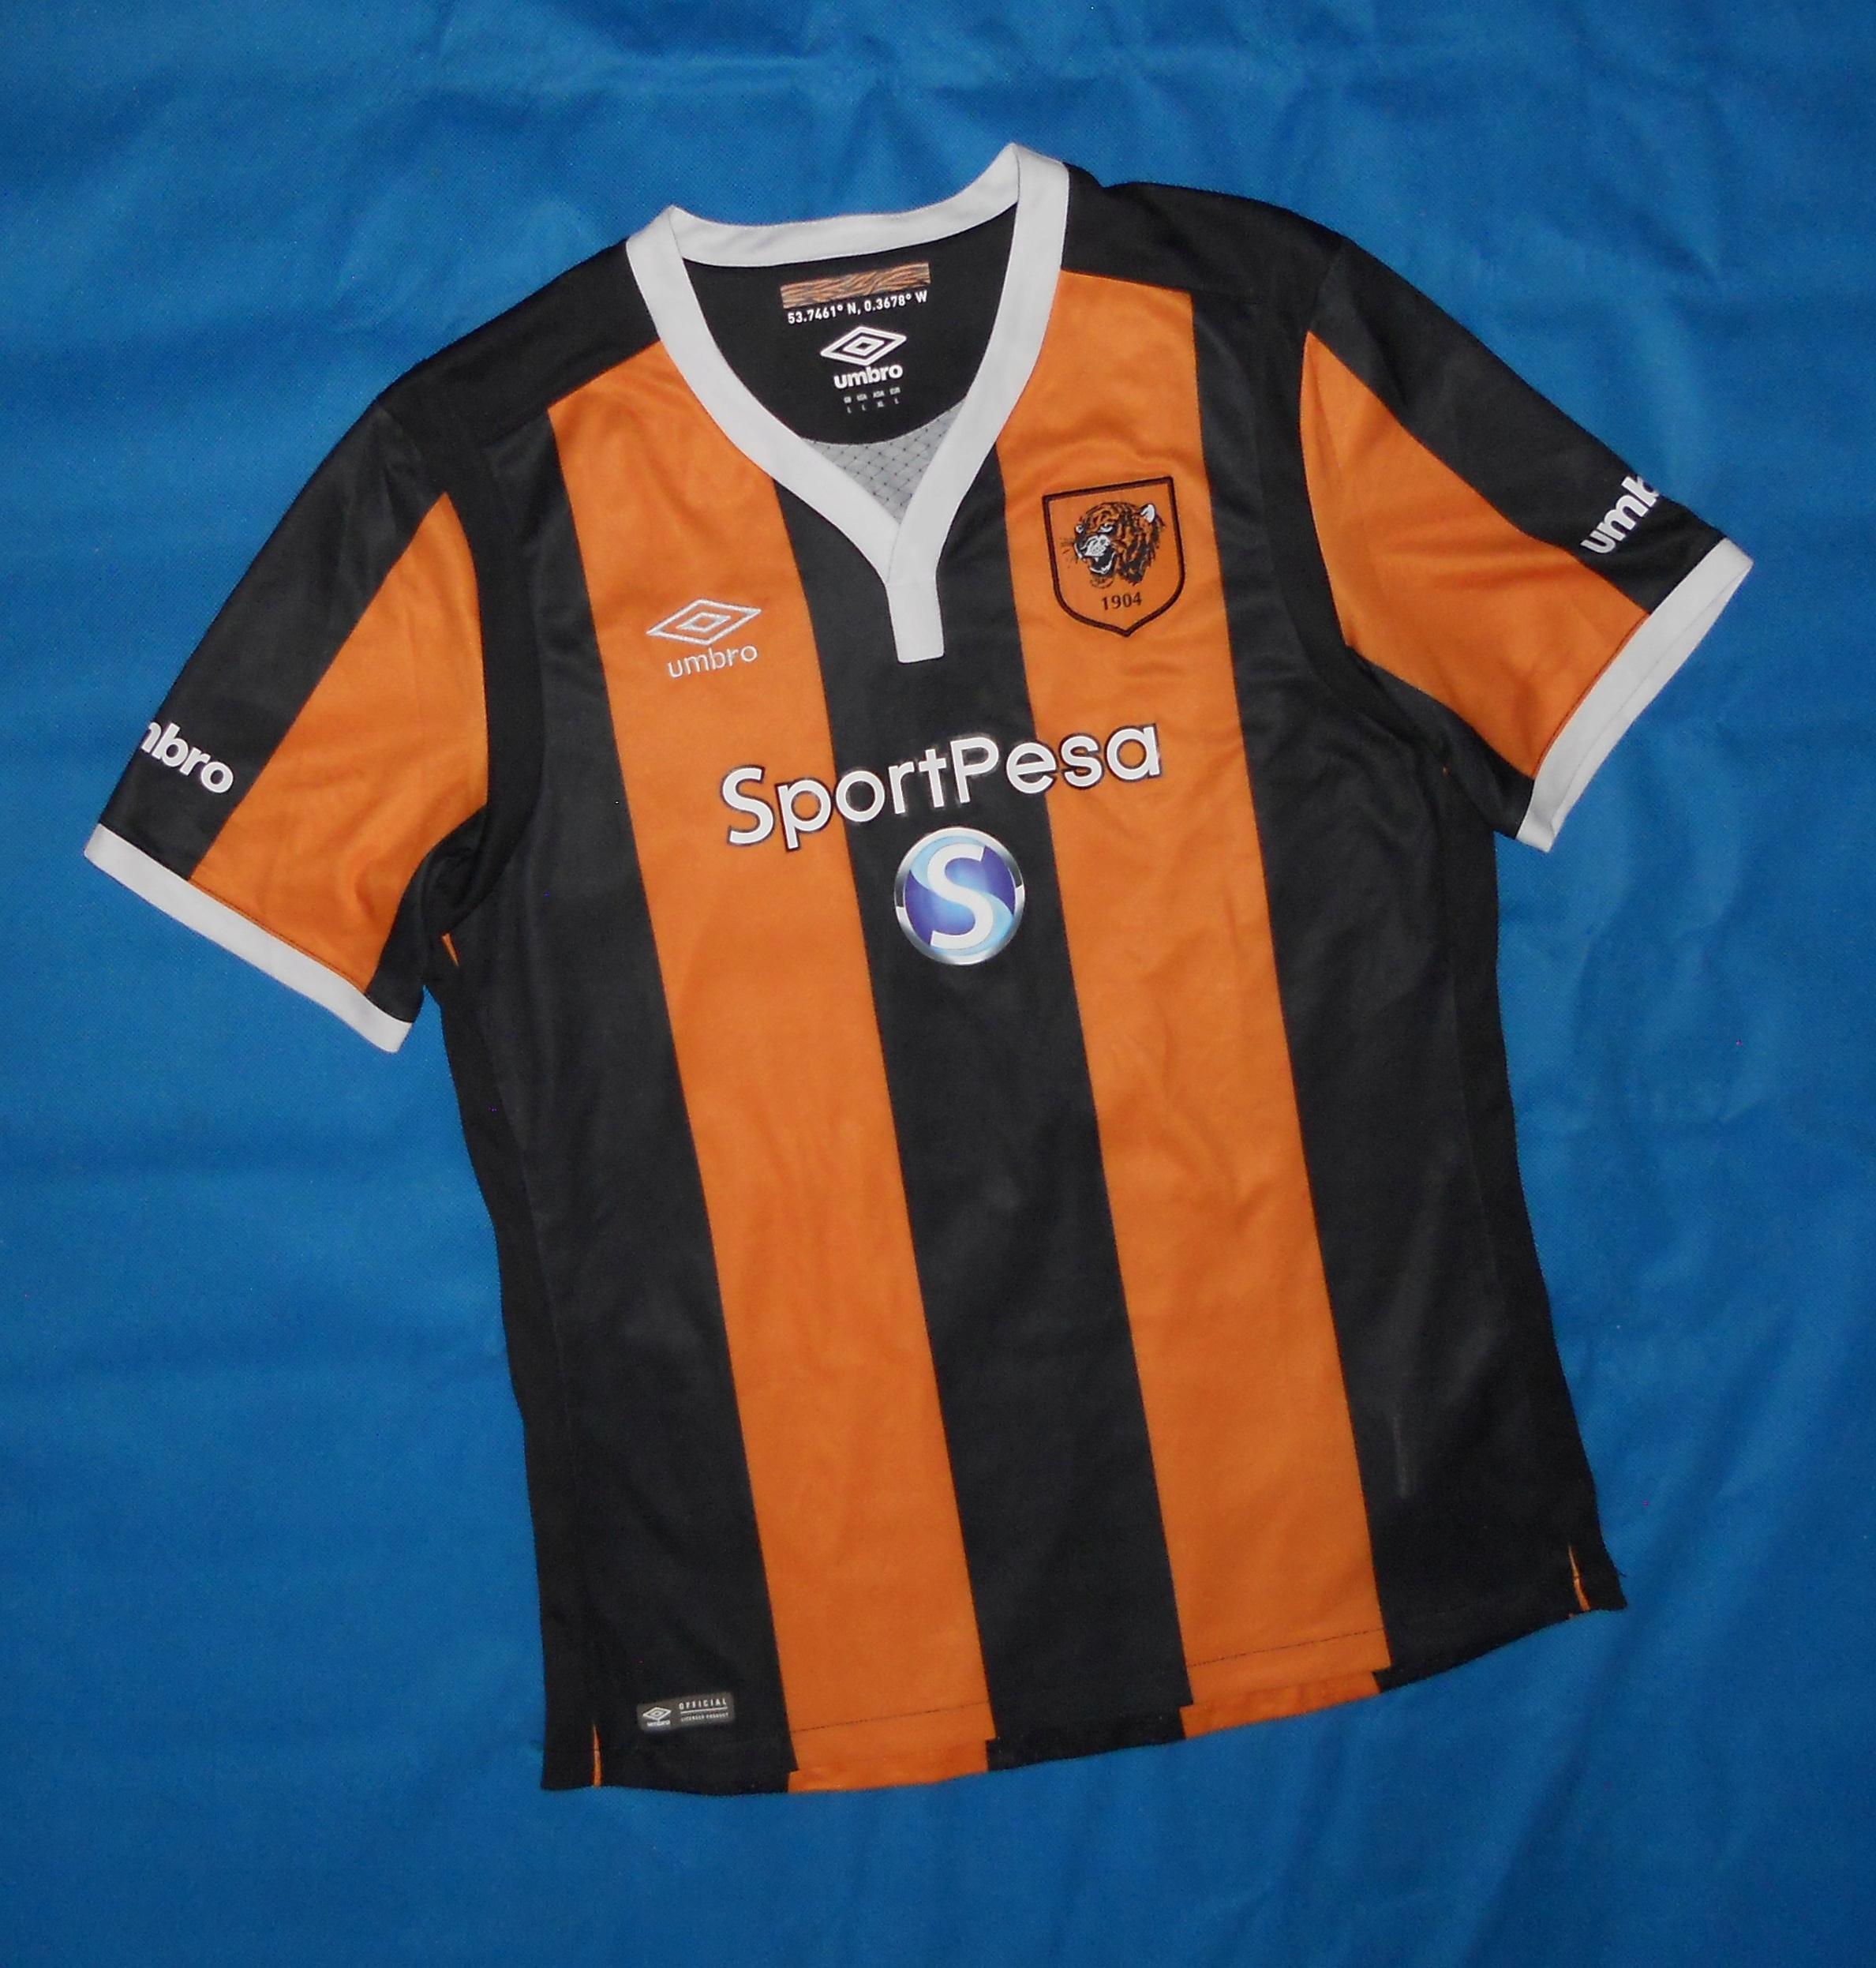 Hull City AFC Umbro Home Shirt 2016/17 Unikat L